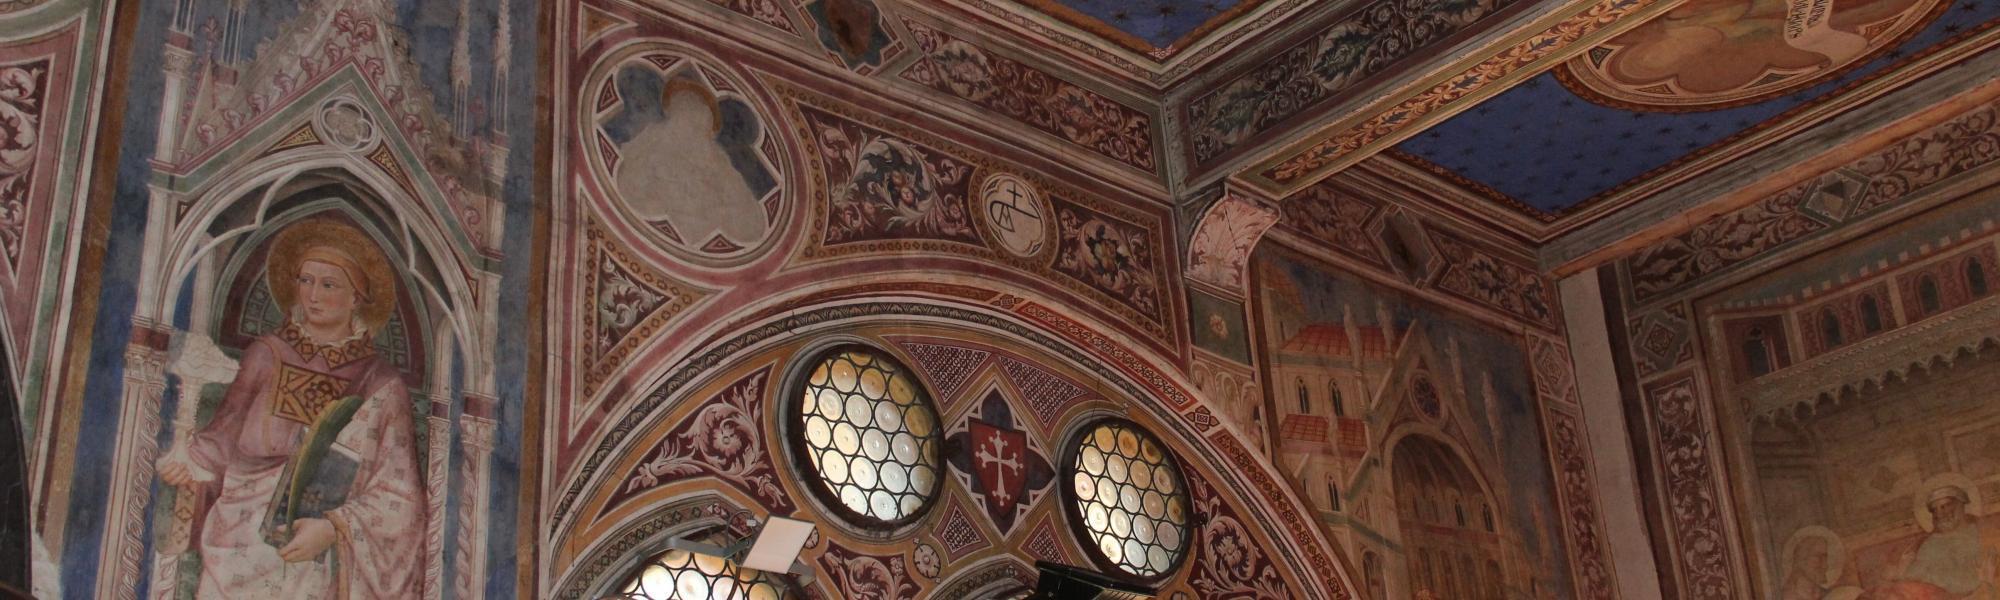 Decorazione interna navata Chiesa di San Francesco (G. Bettini, Comune di Pisa)